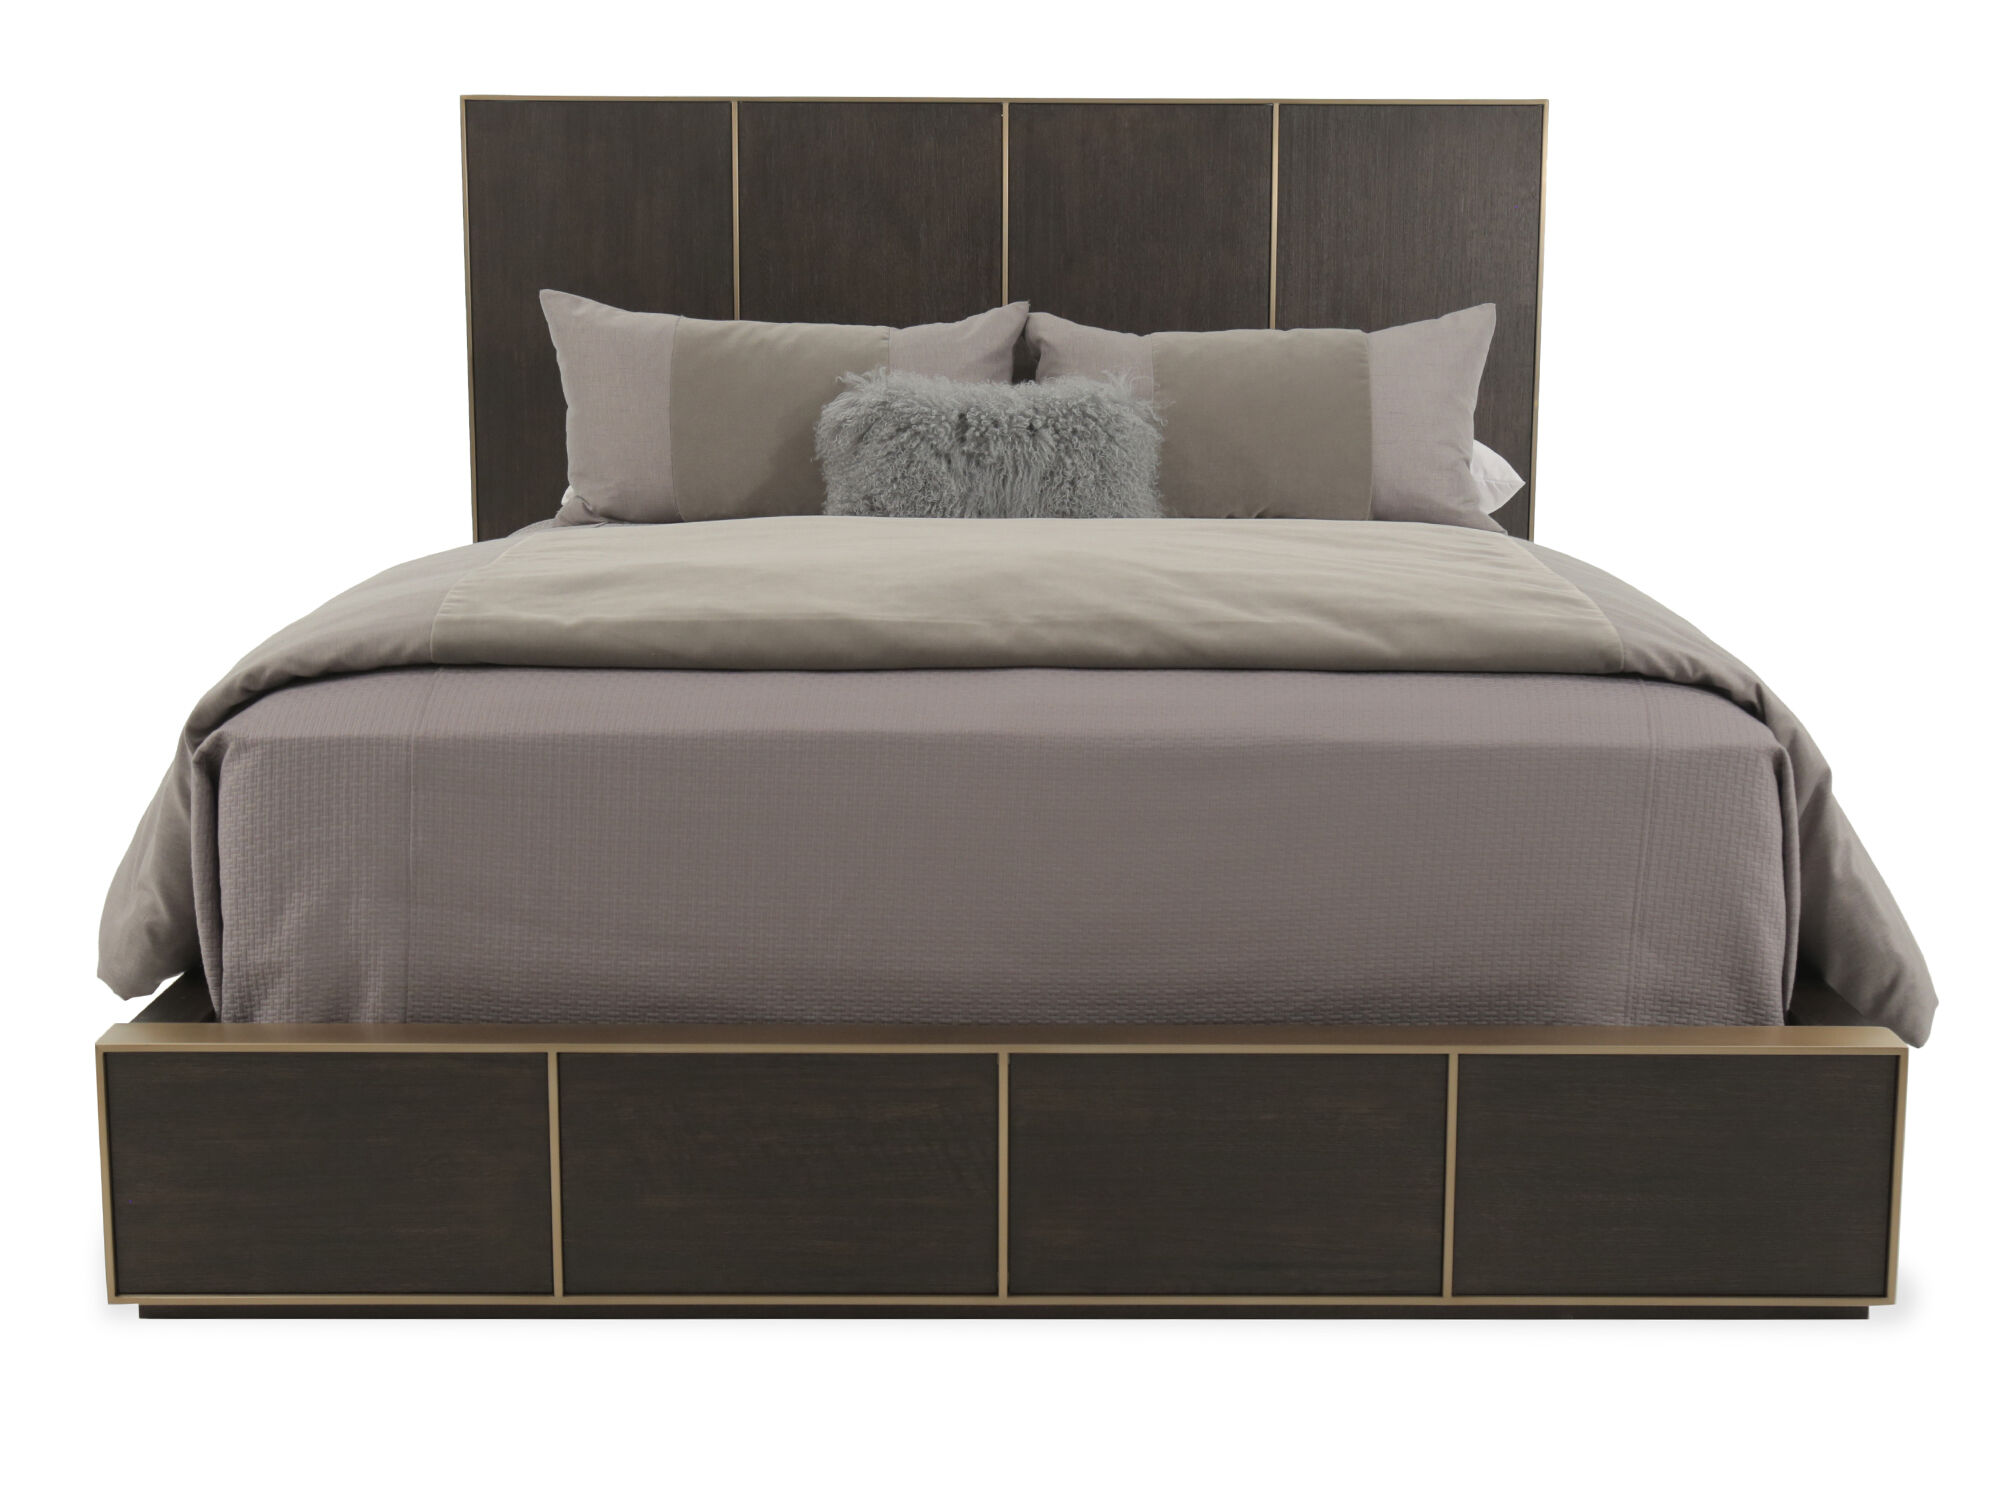 Hooker Curata Midnight California King Low Bed ...